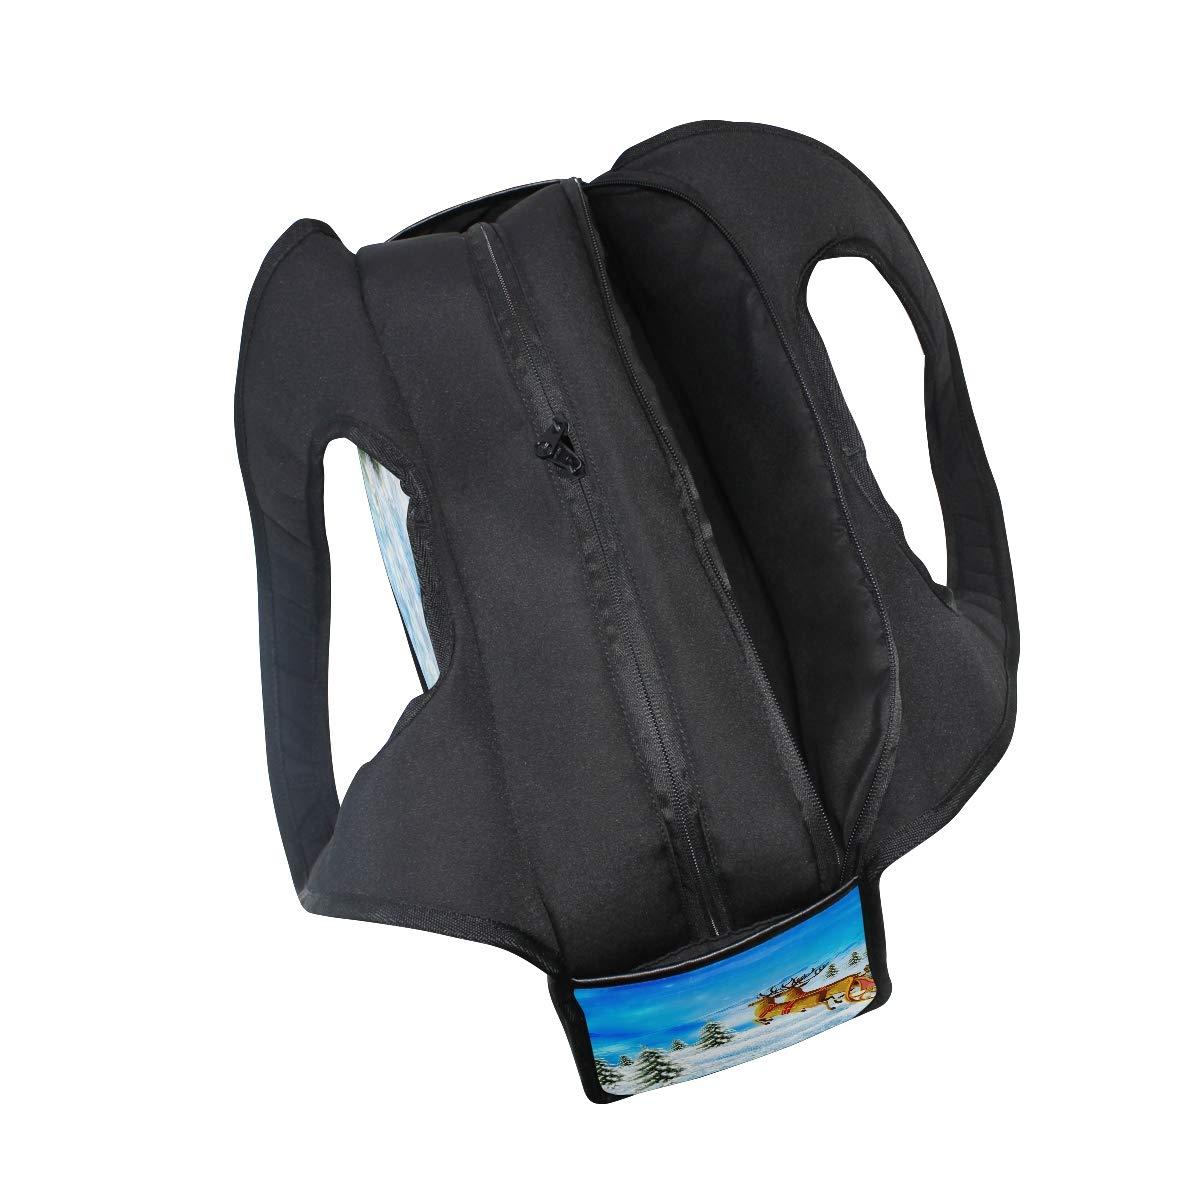 70c2c91d8459 Amazon.com  HUVATT Gym Bag Happy Christmas Day Women Yoga Canvas Duffel Bag  Sports Tote Bags for Girls  Sports   Outdoors